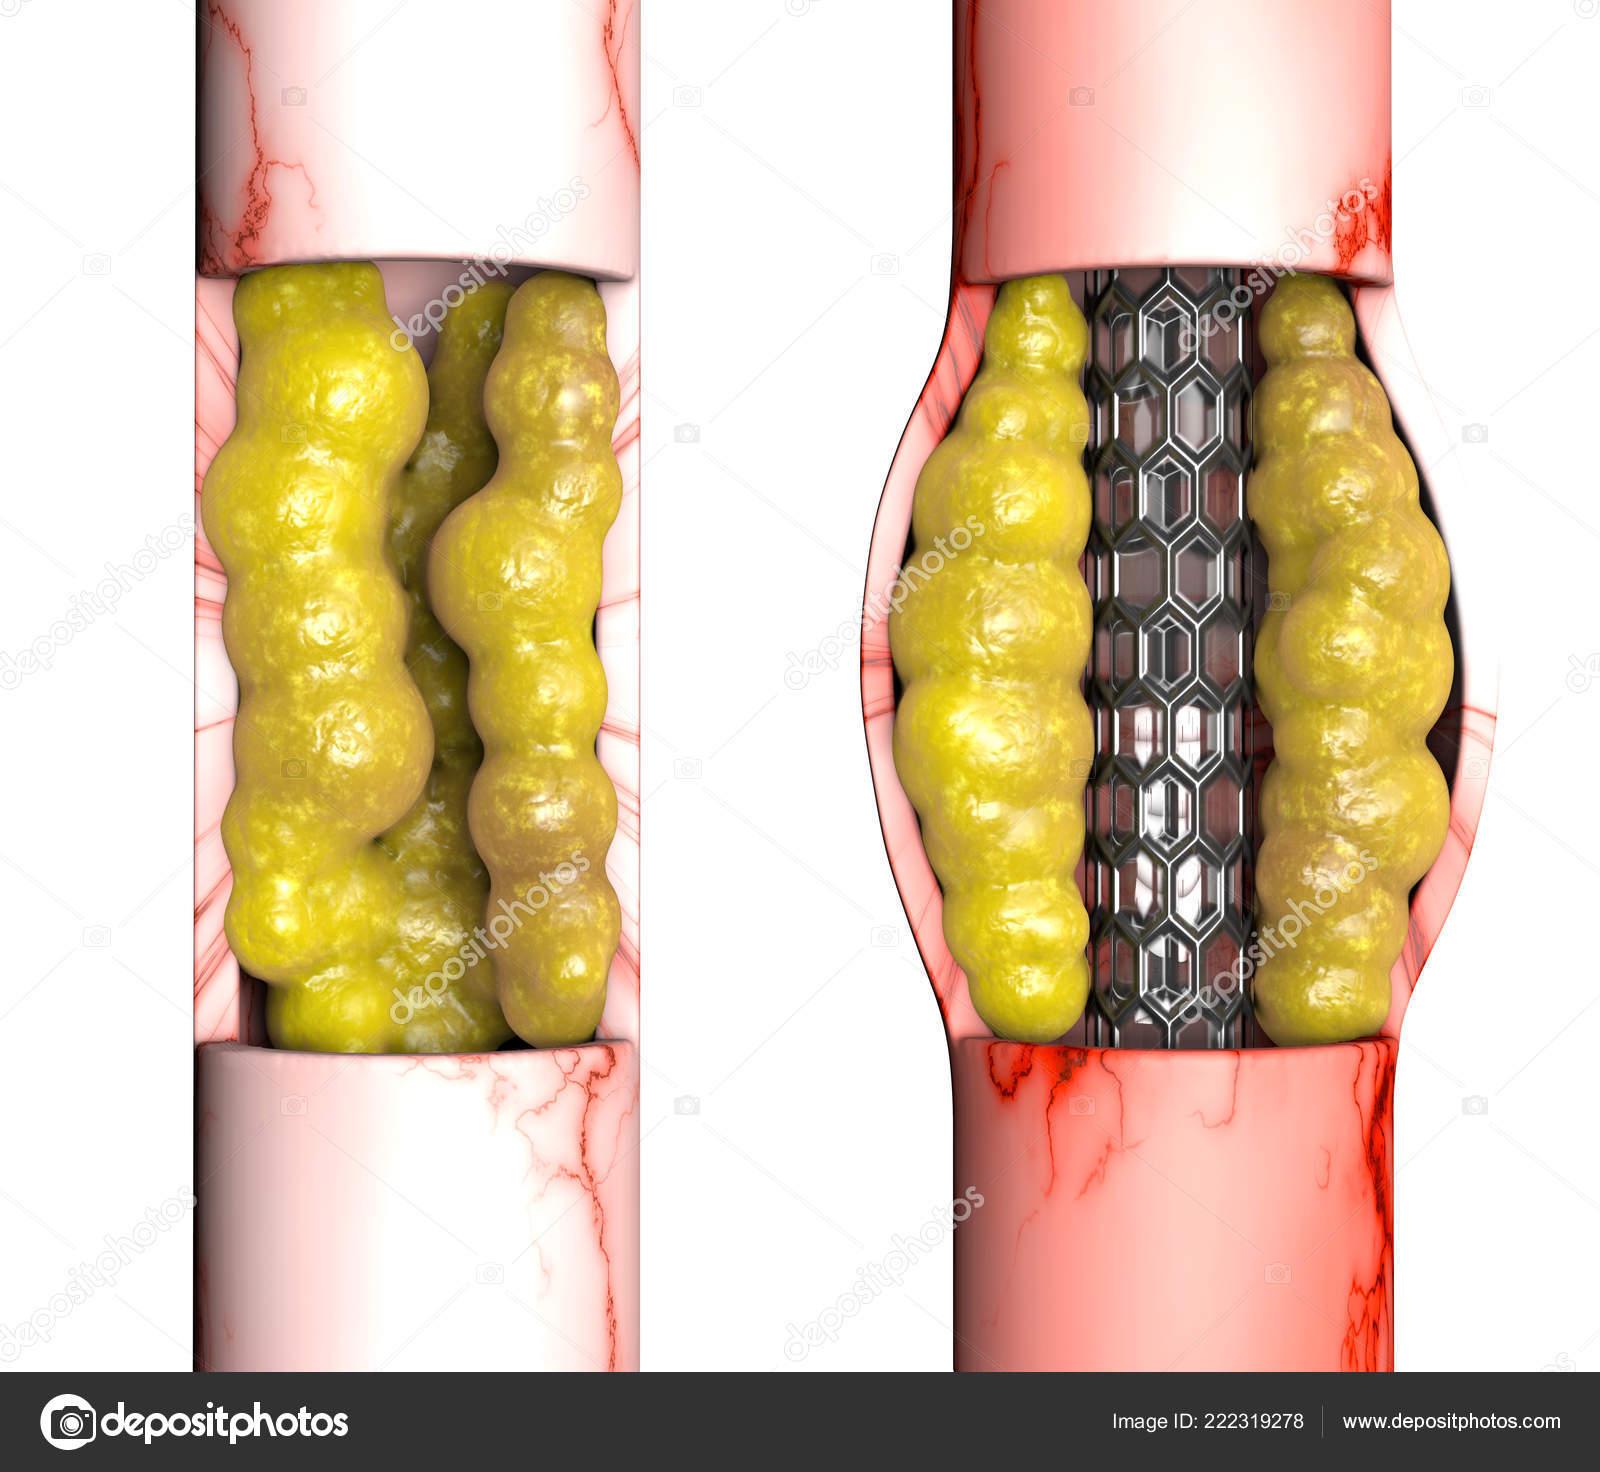 Coronary Artery Bypass Surgery Surgical Procedure Restore